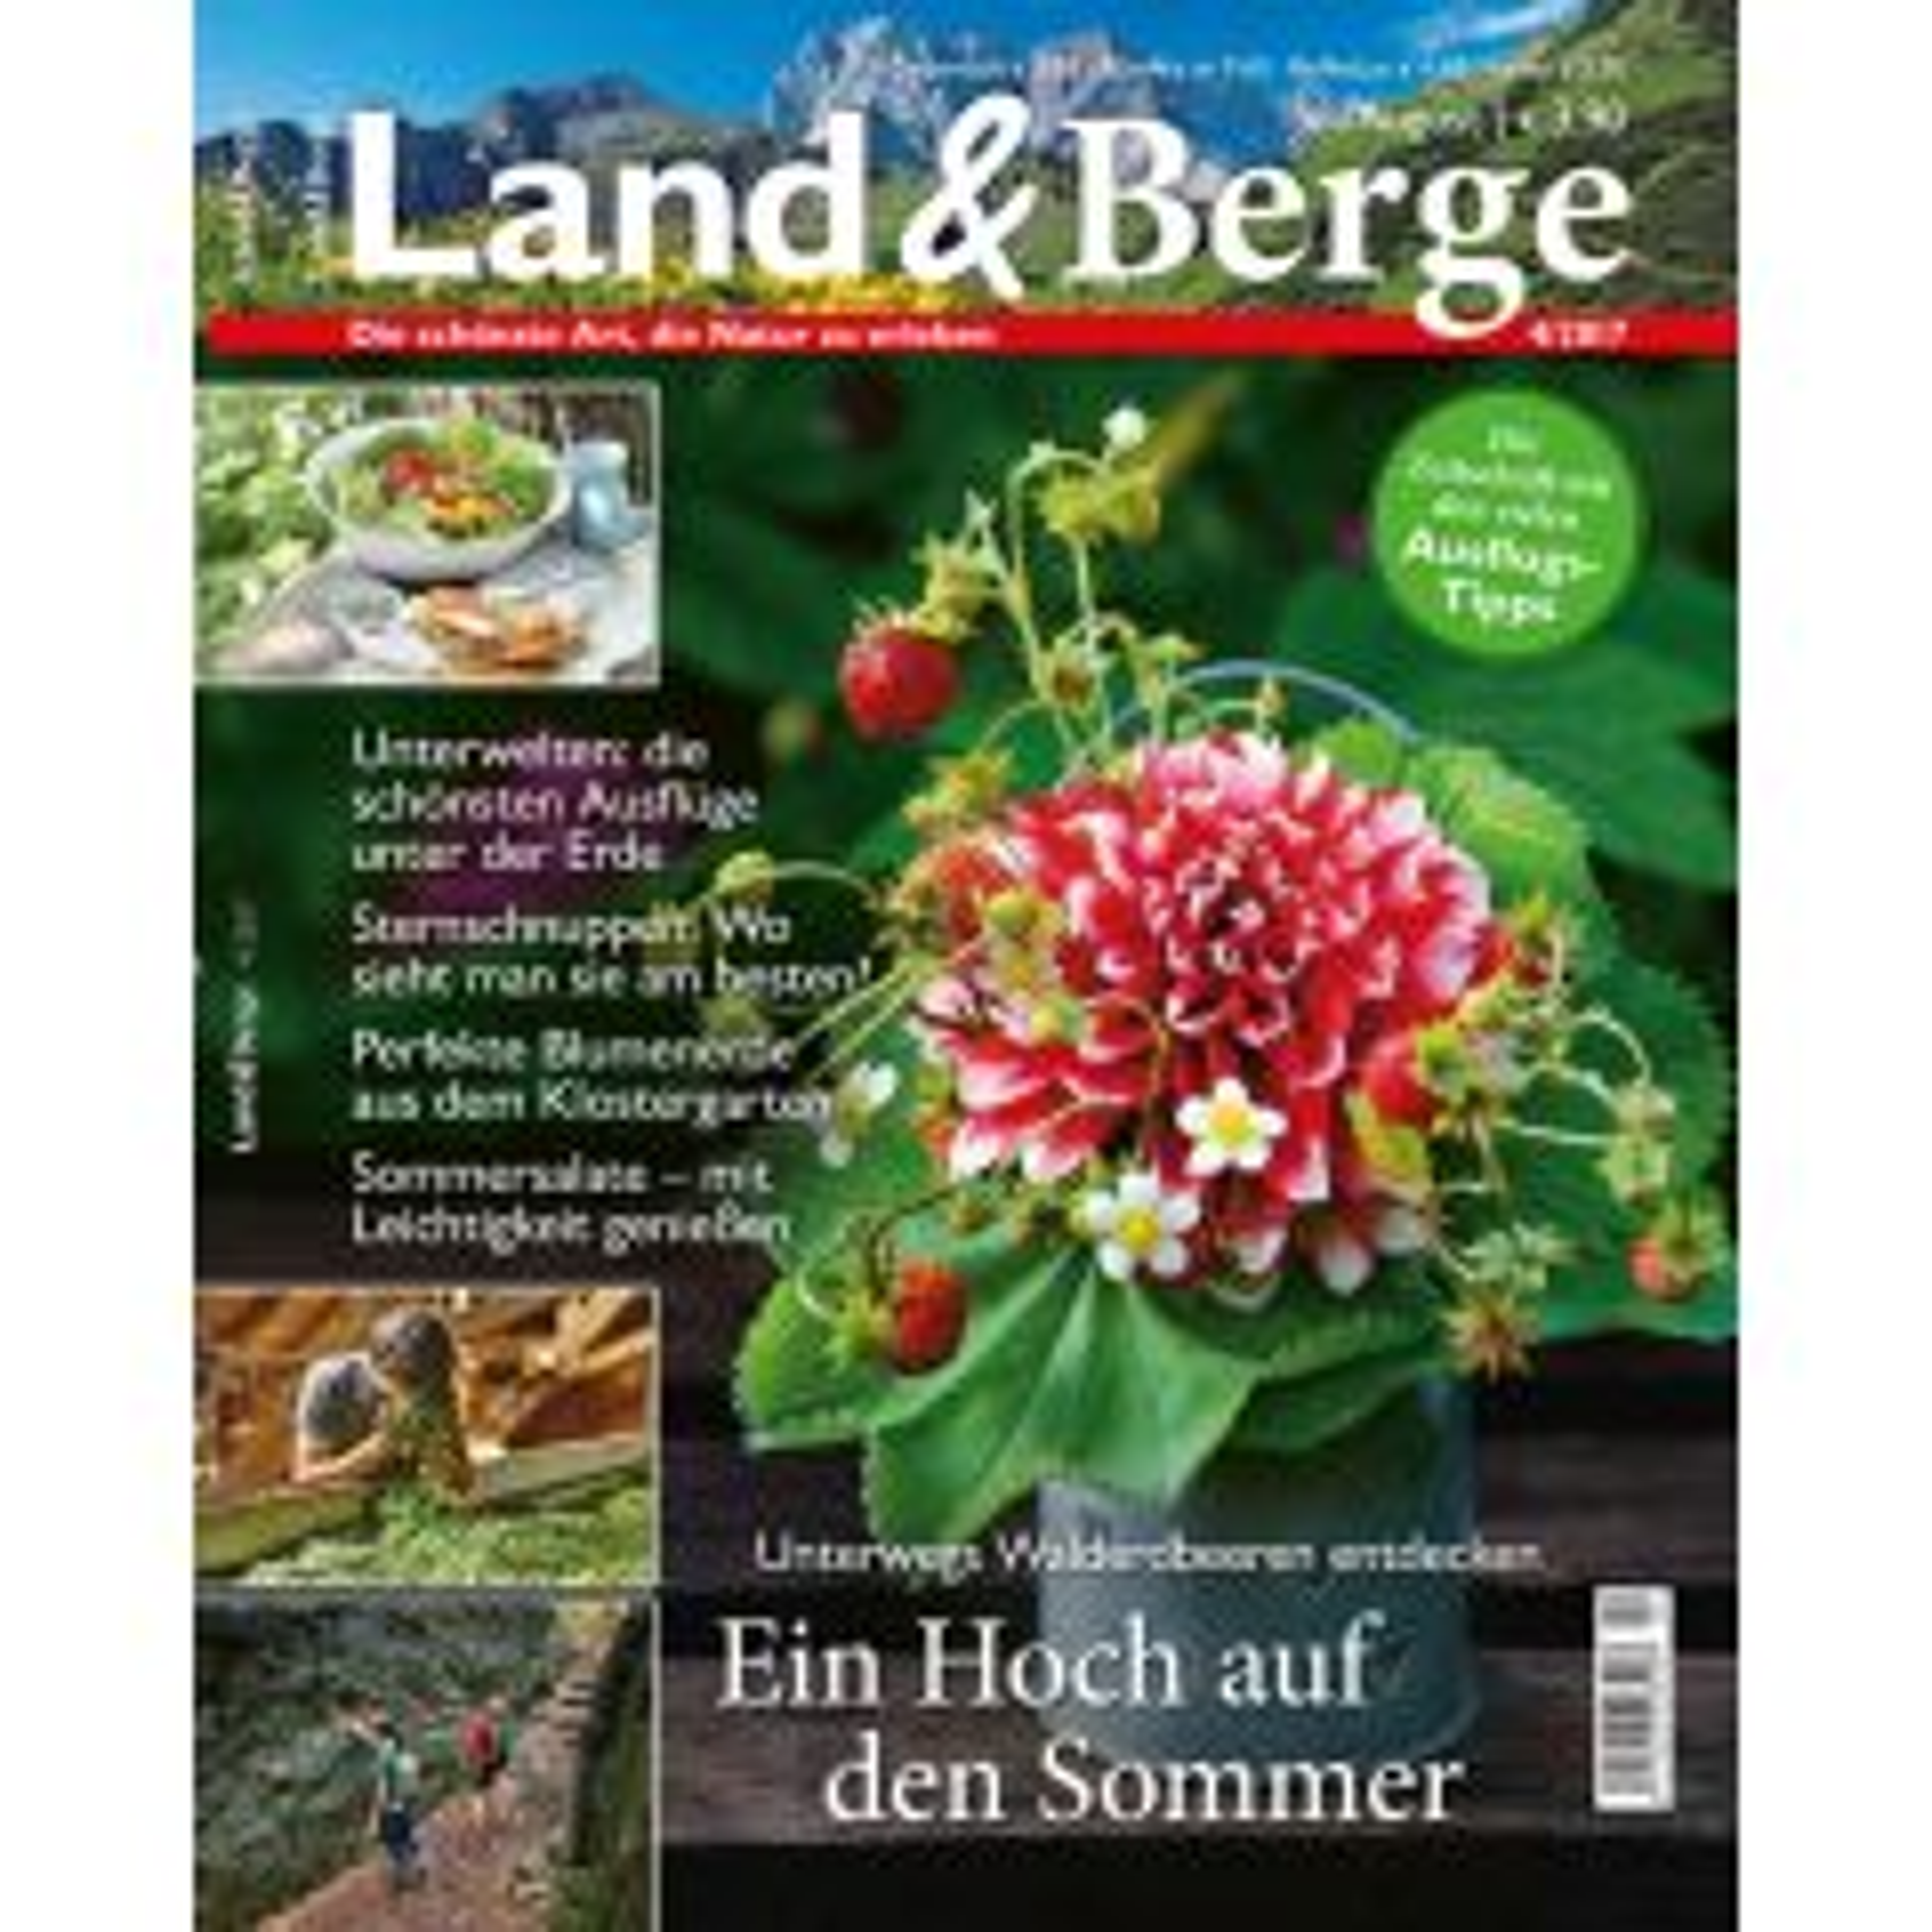 Land & Berge 4/2017